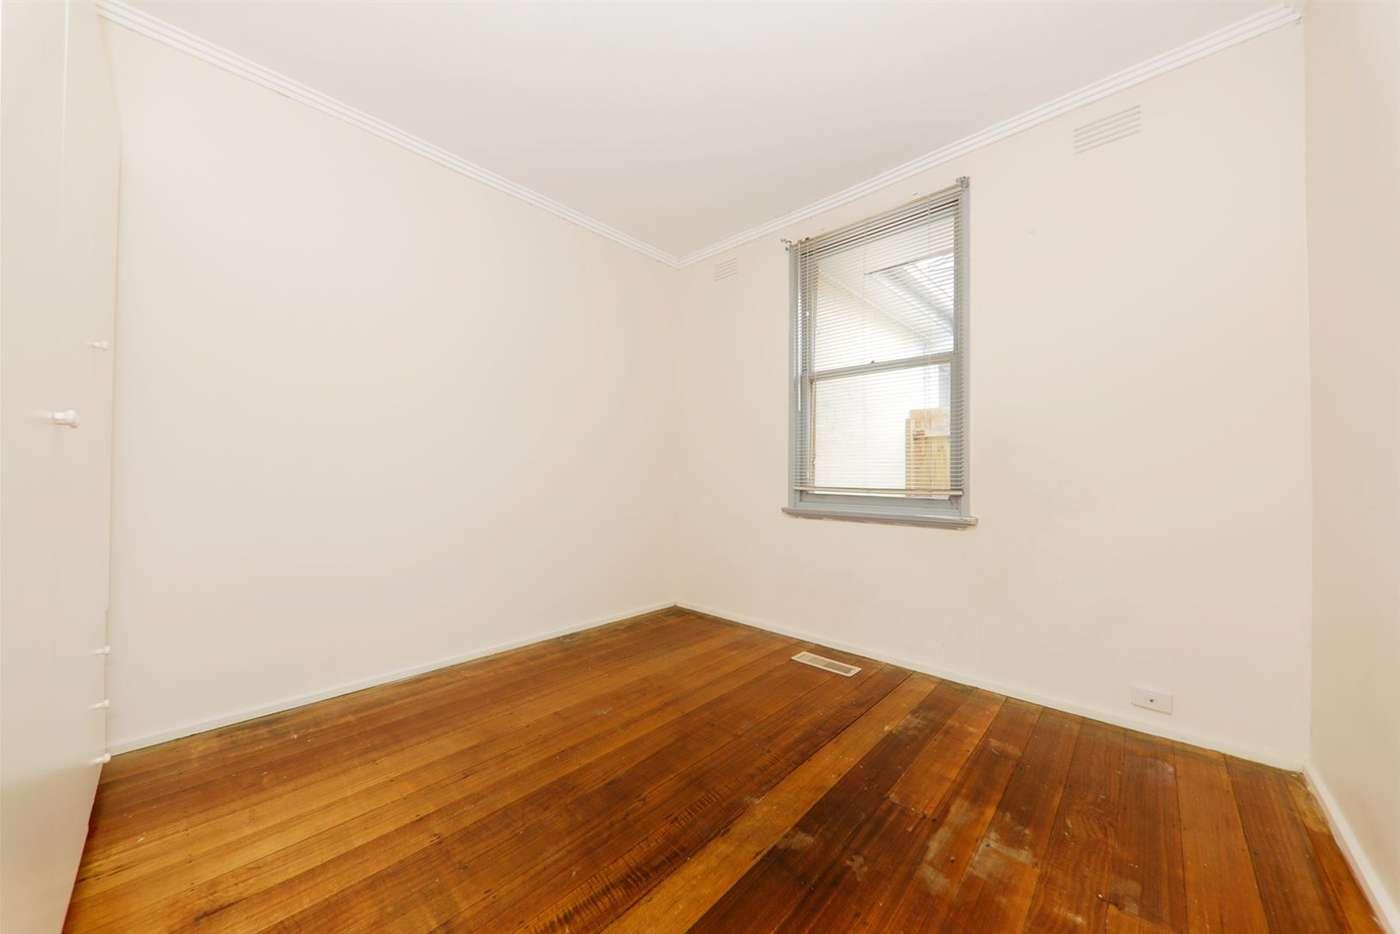 Seventh view of Homely unit listing, 1/5 Kuebler Street, Glen Waverley VIC 3150